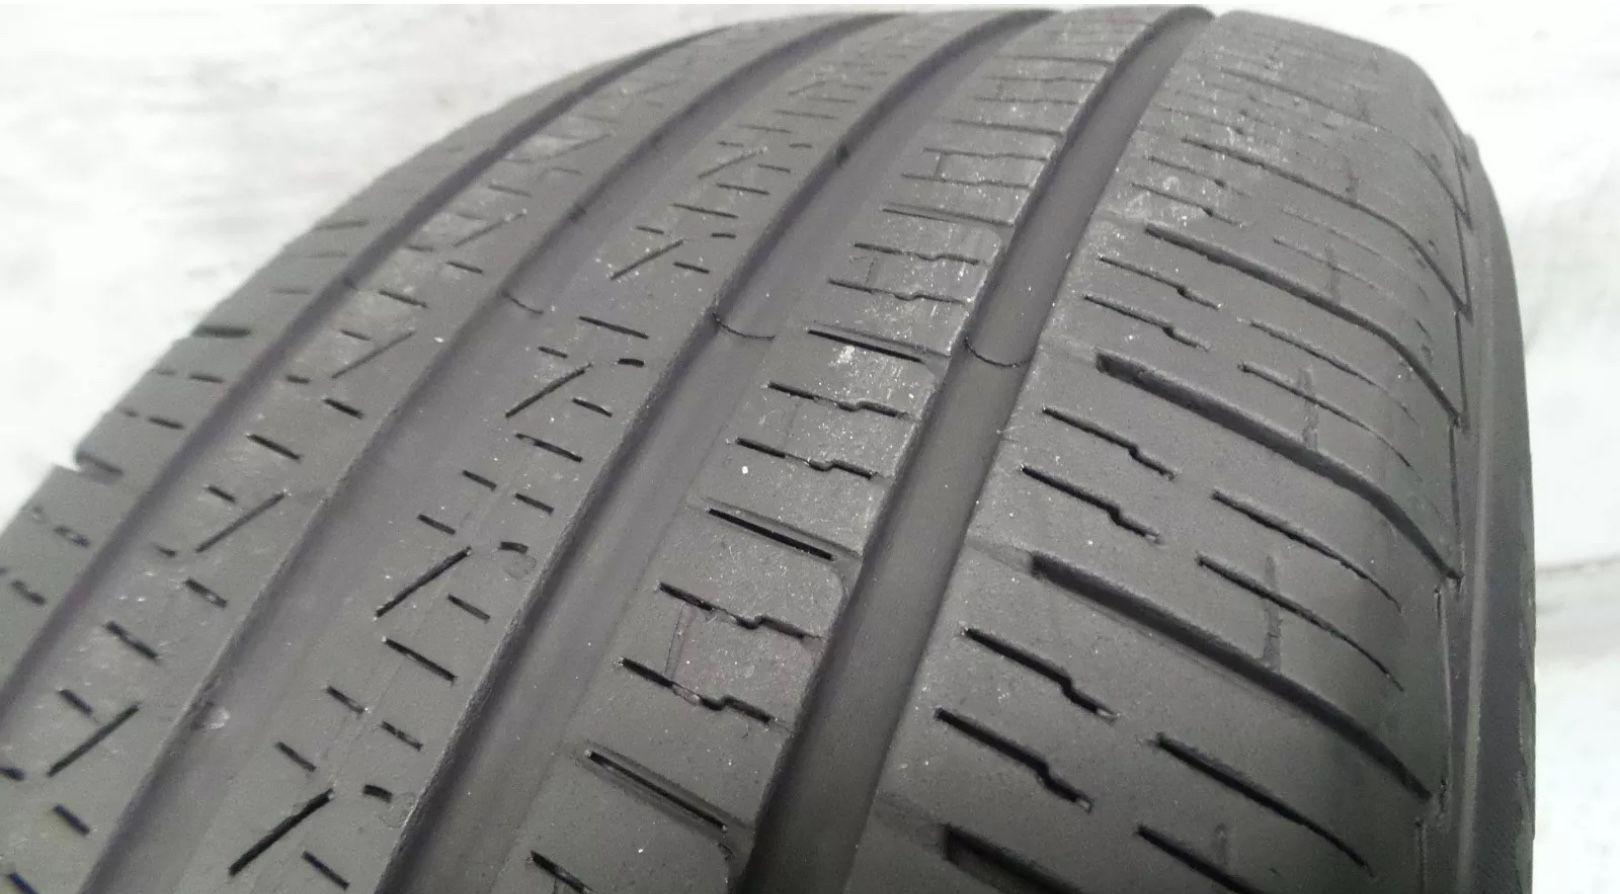 225 50 18 Pirelli Cinturato P7 A/S Runflat 6.40/32 70% life C3788 95v